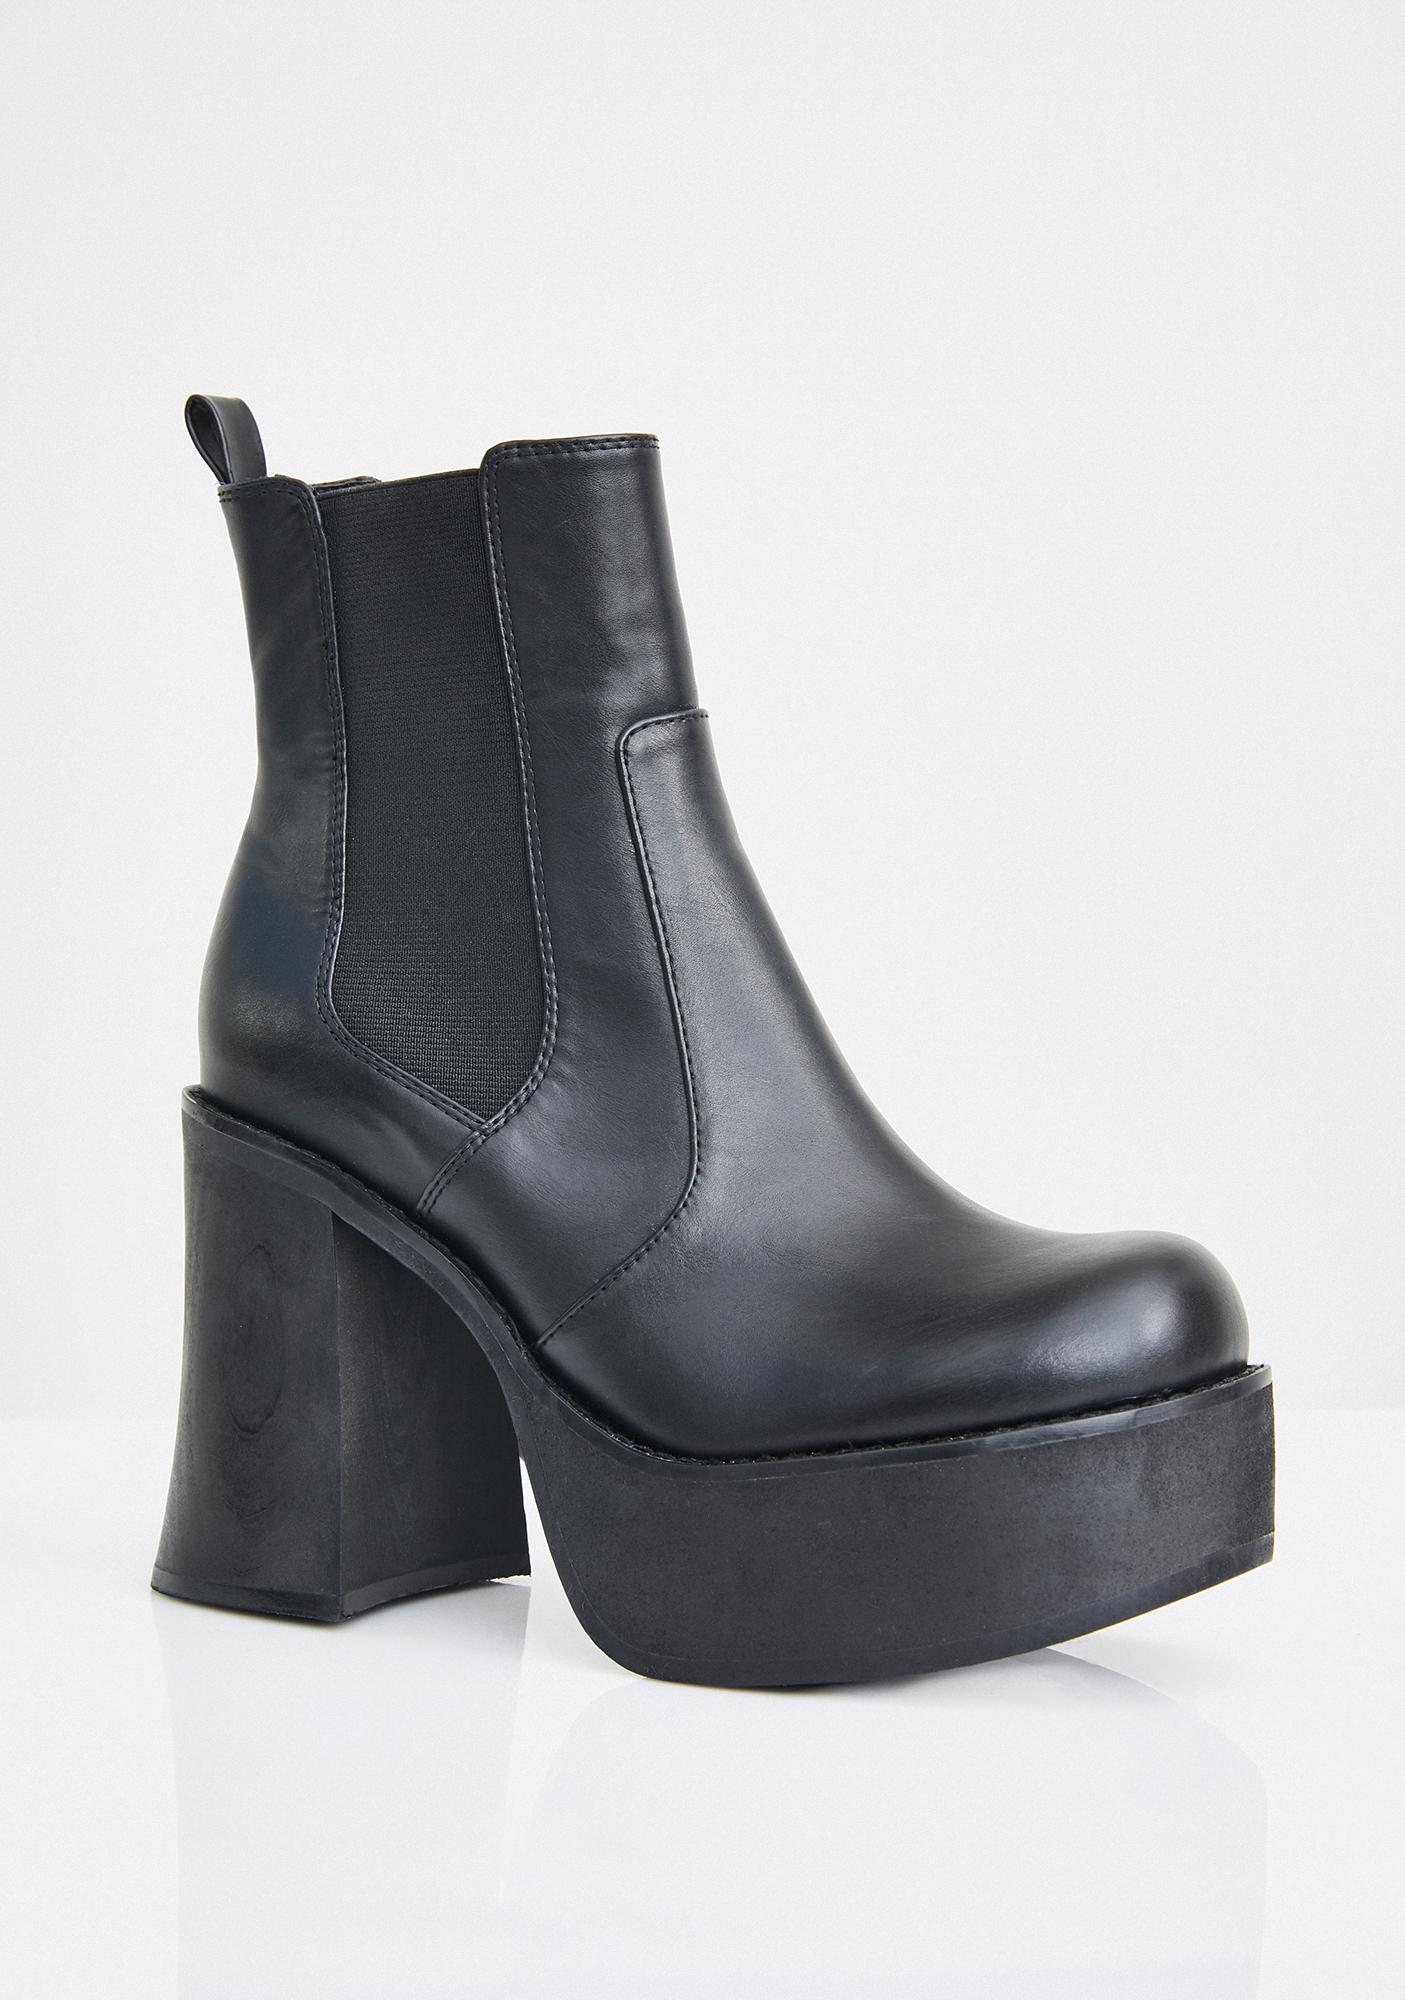 Current Mood Heavy Hittas Platform Boots